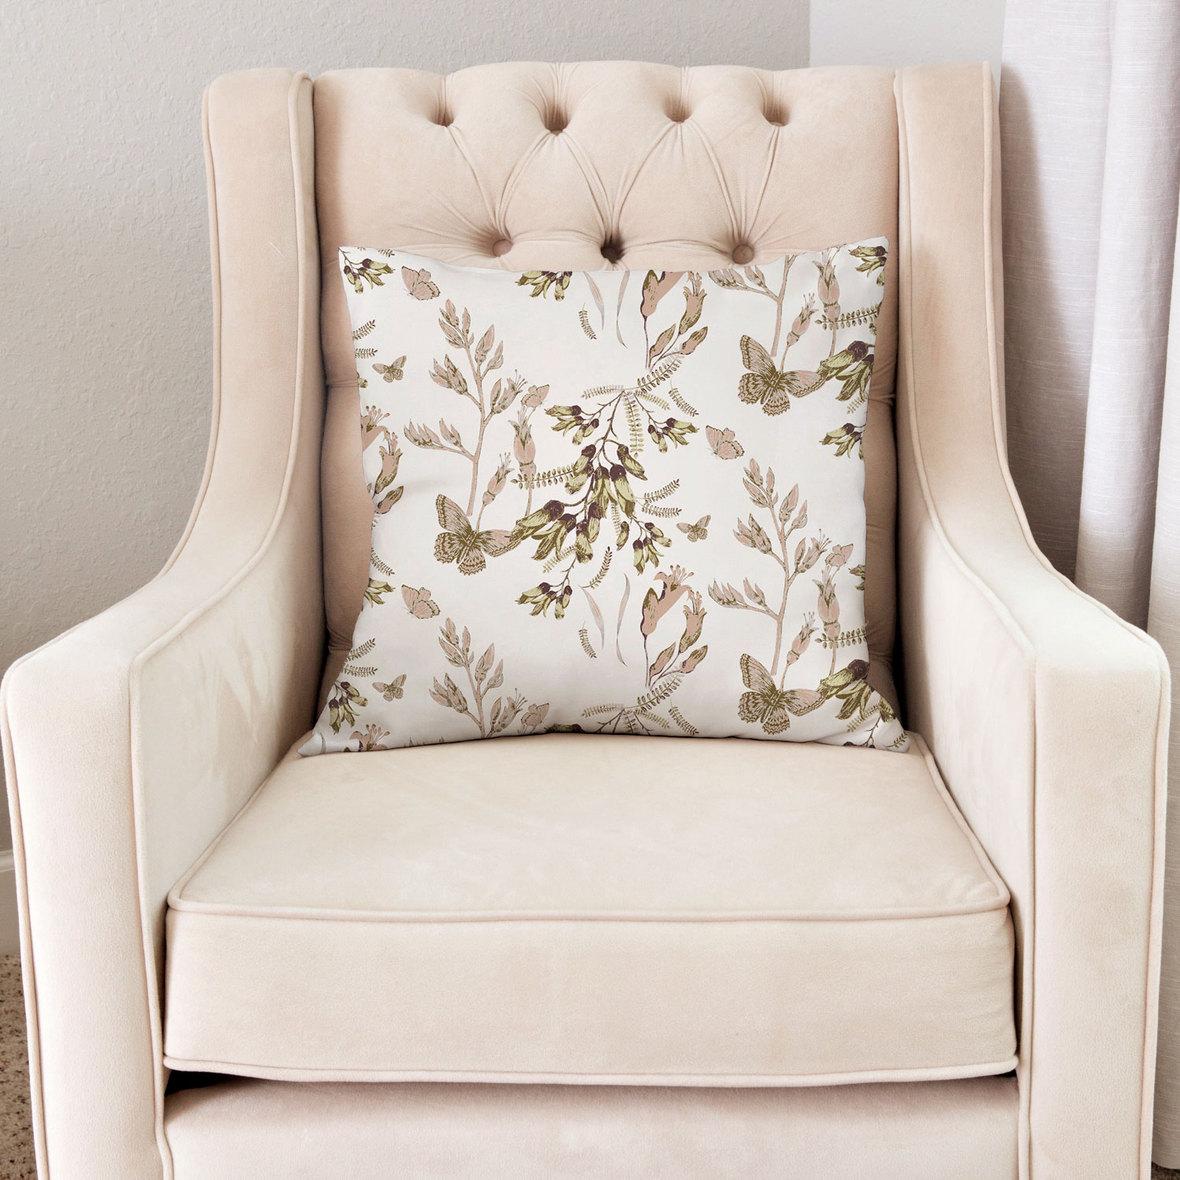 Pillow-in-Chair-20-in-Butterfly-Garden-in-Ivory